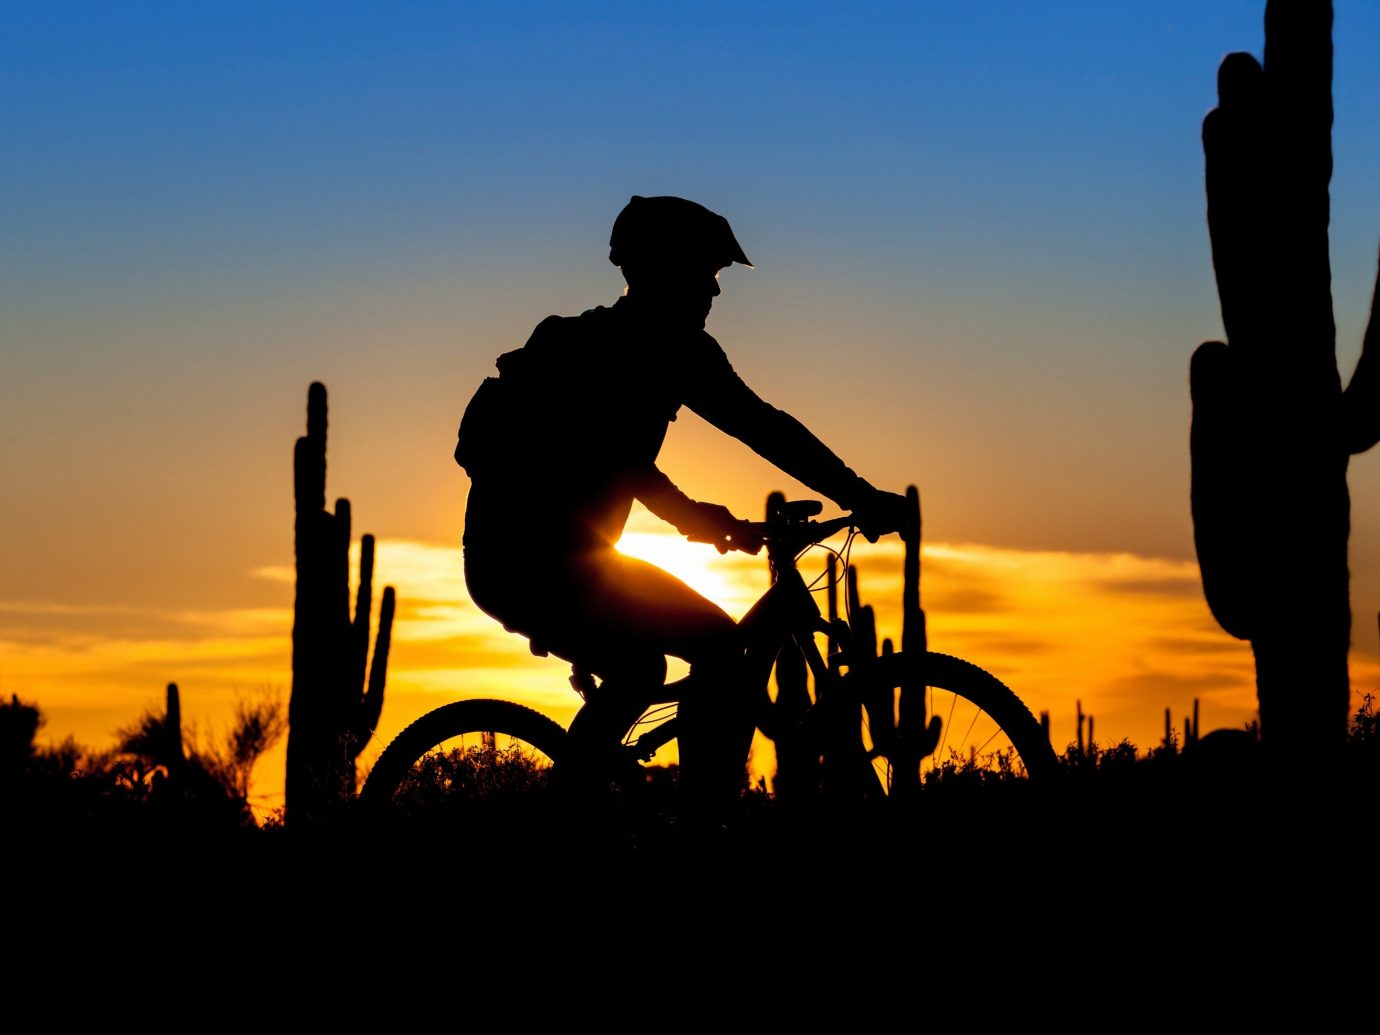 Trip Ideas sky outdoor plant cactus Sunset silhouette Sun morning evening sunrise dusk setting dawn dark clouds day